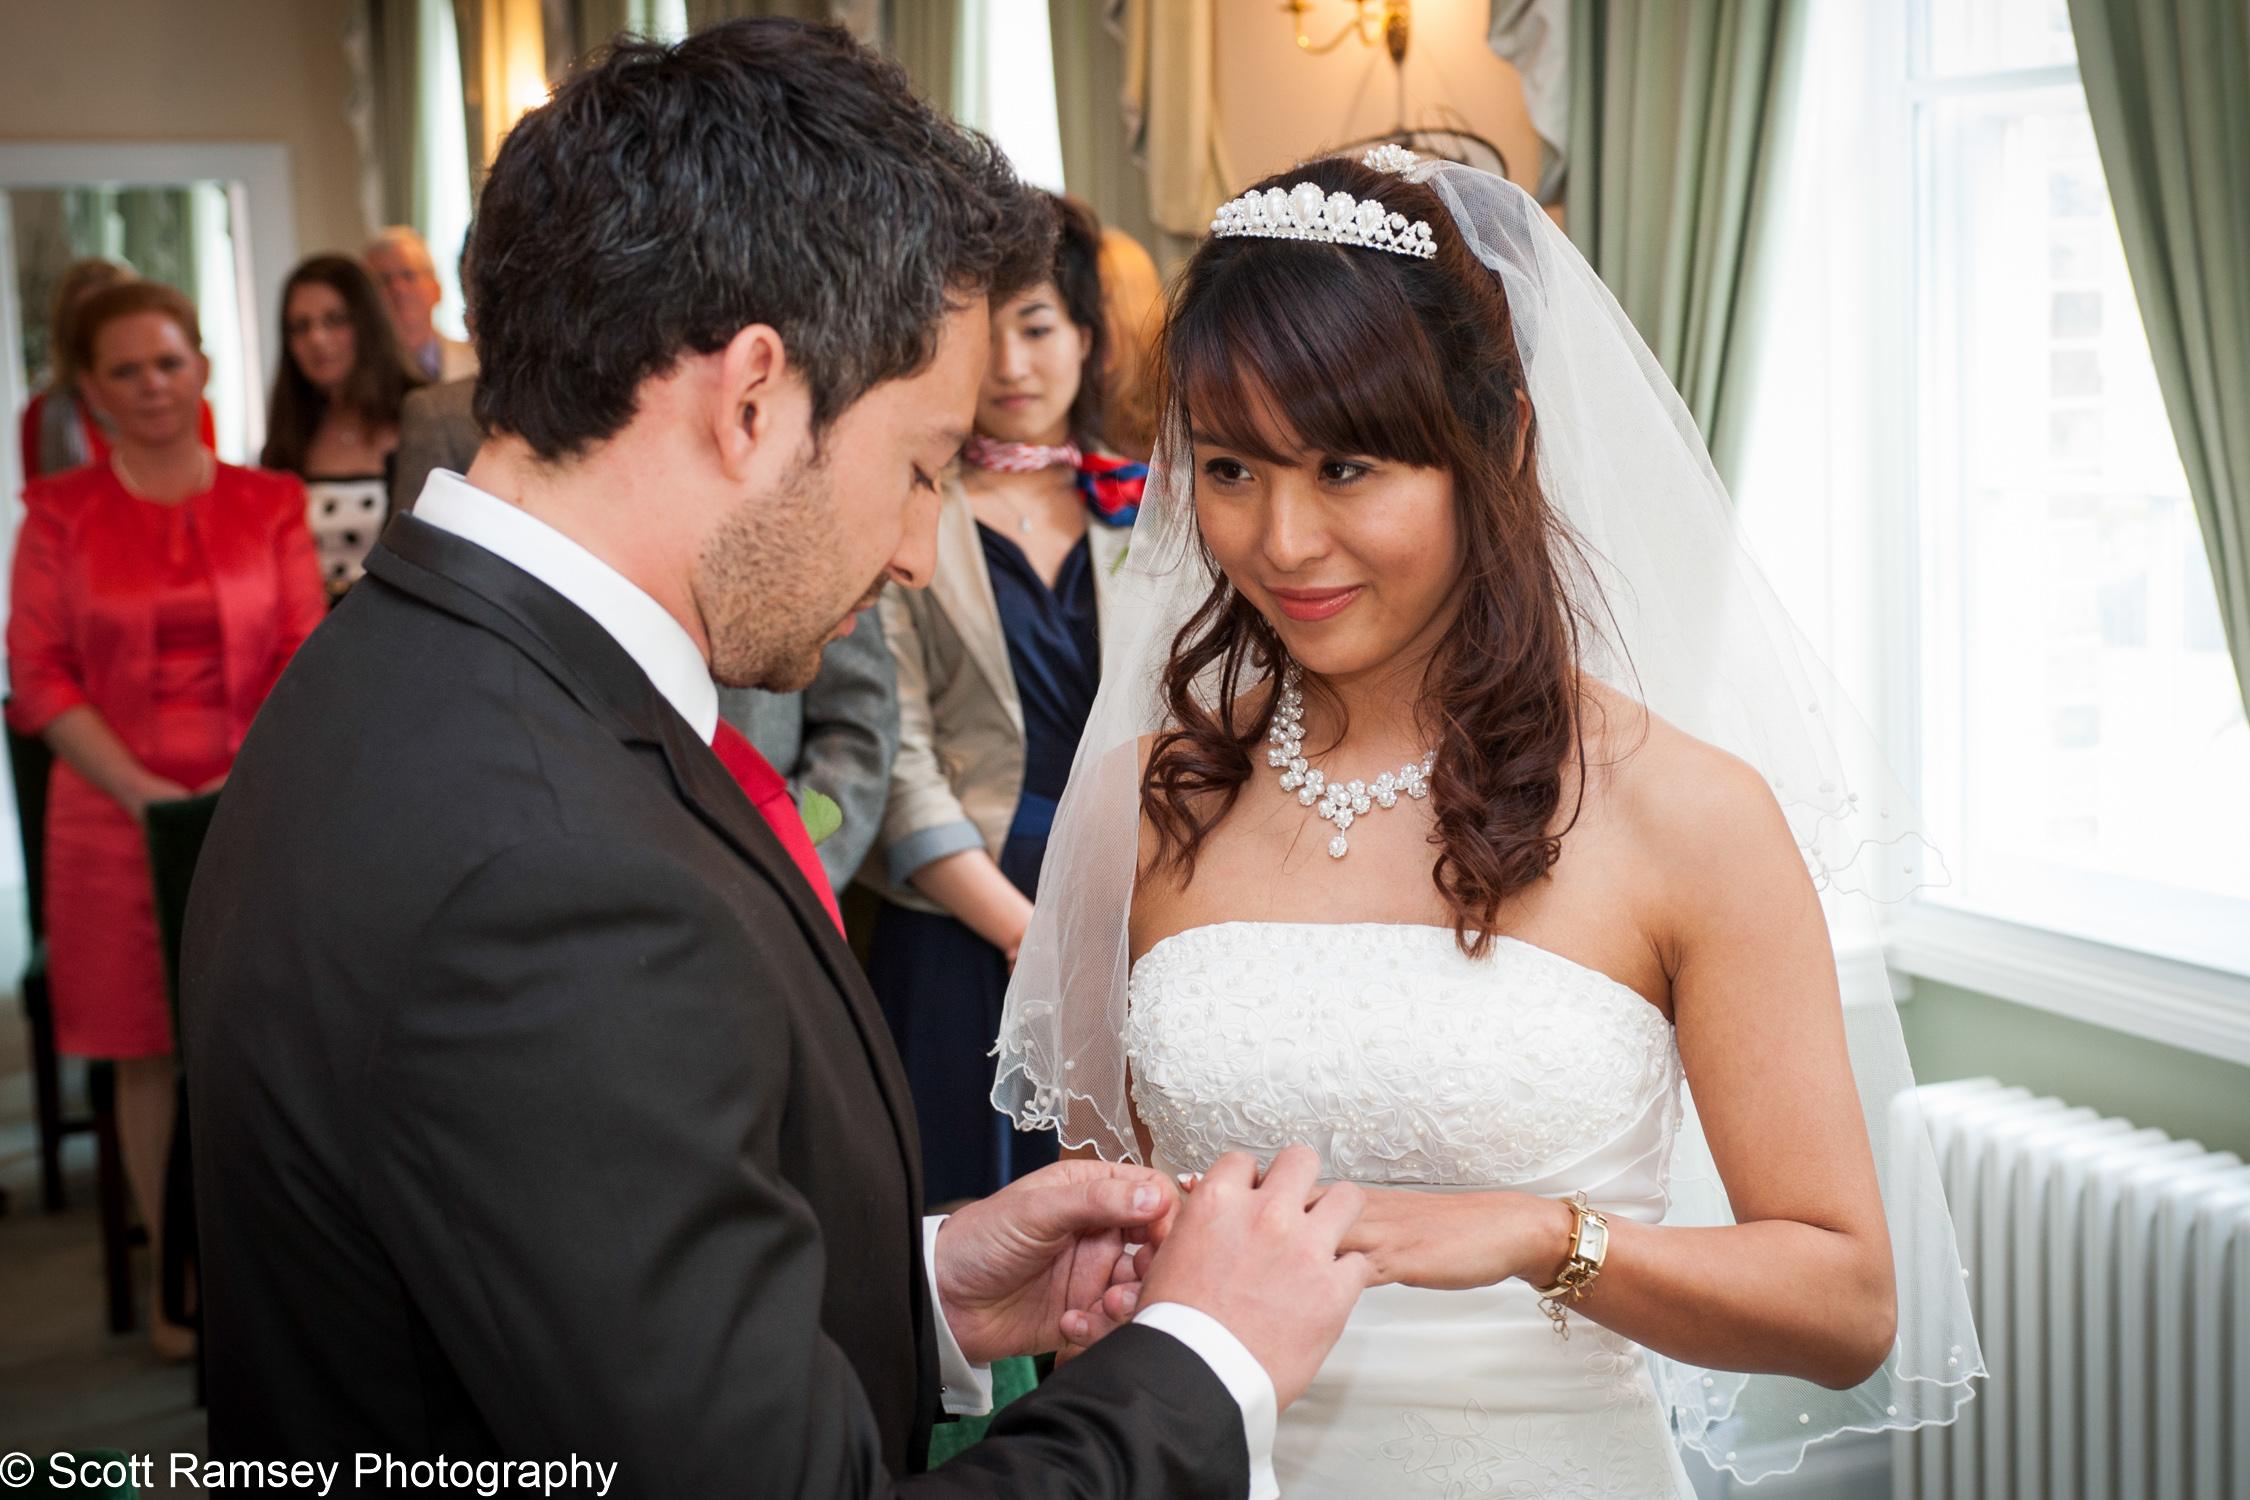 Portsmouth Registry Office Wedding Bride Looks At Groom 040513-14